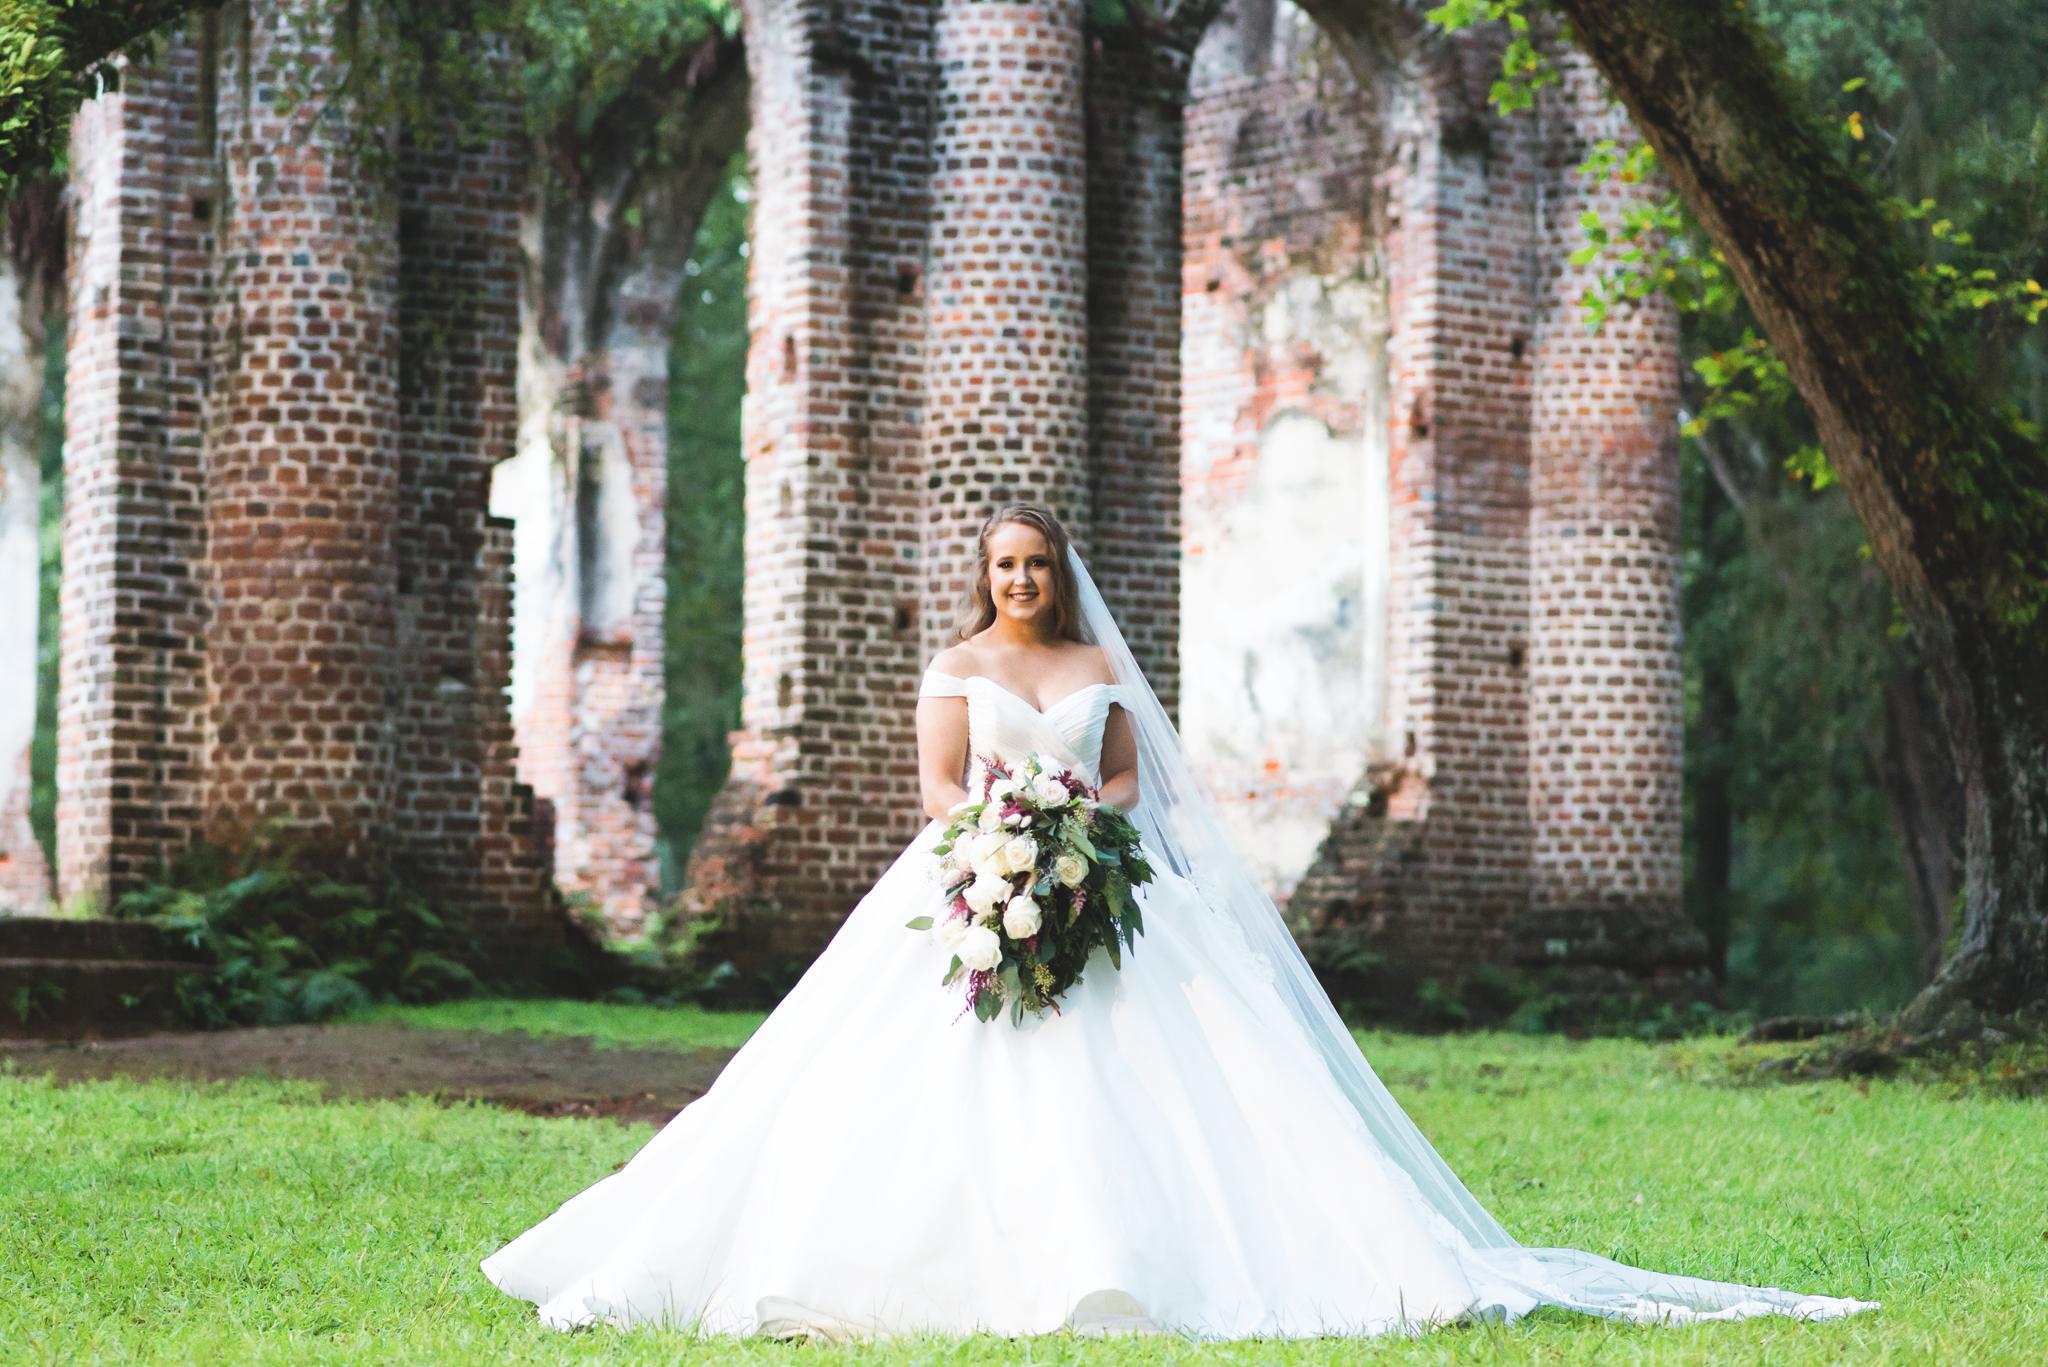 Bridals_AmberRay_blog-27.jpg